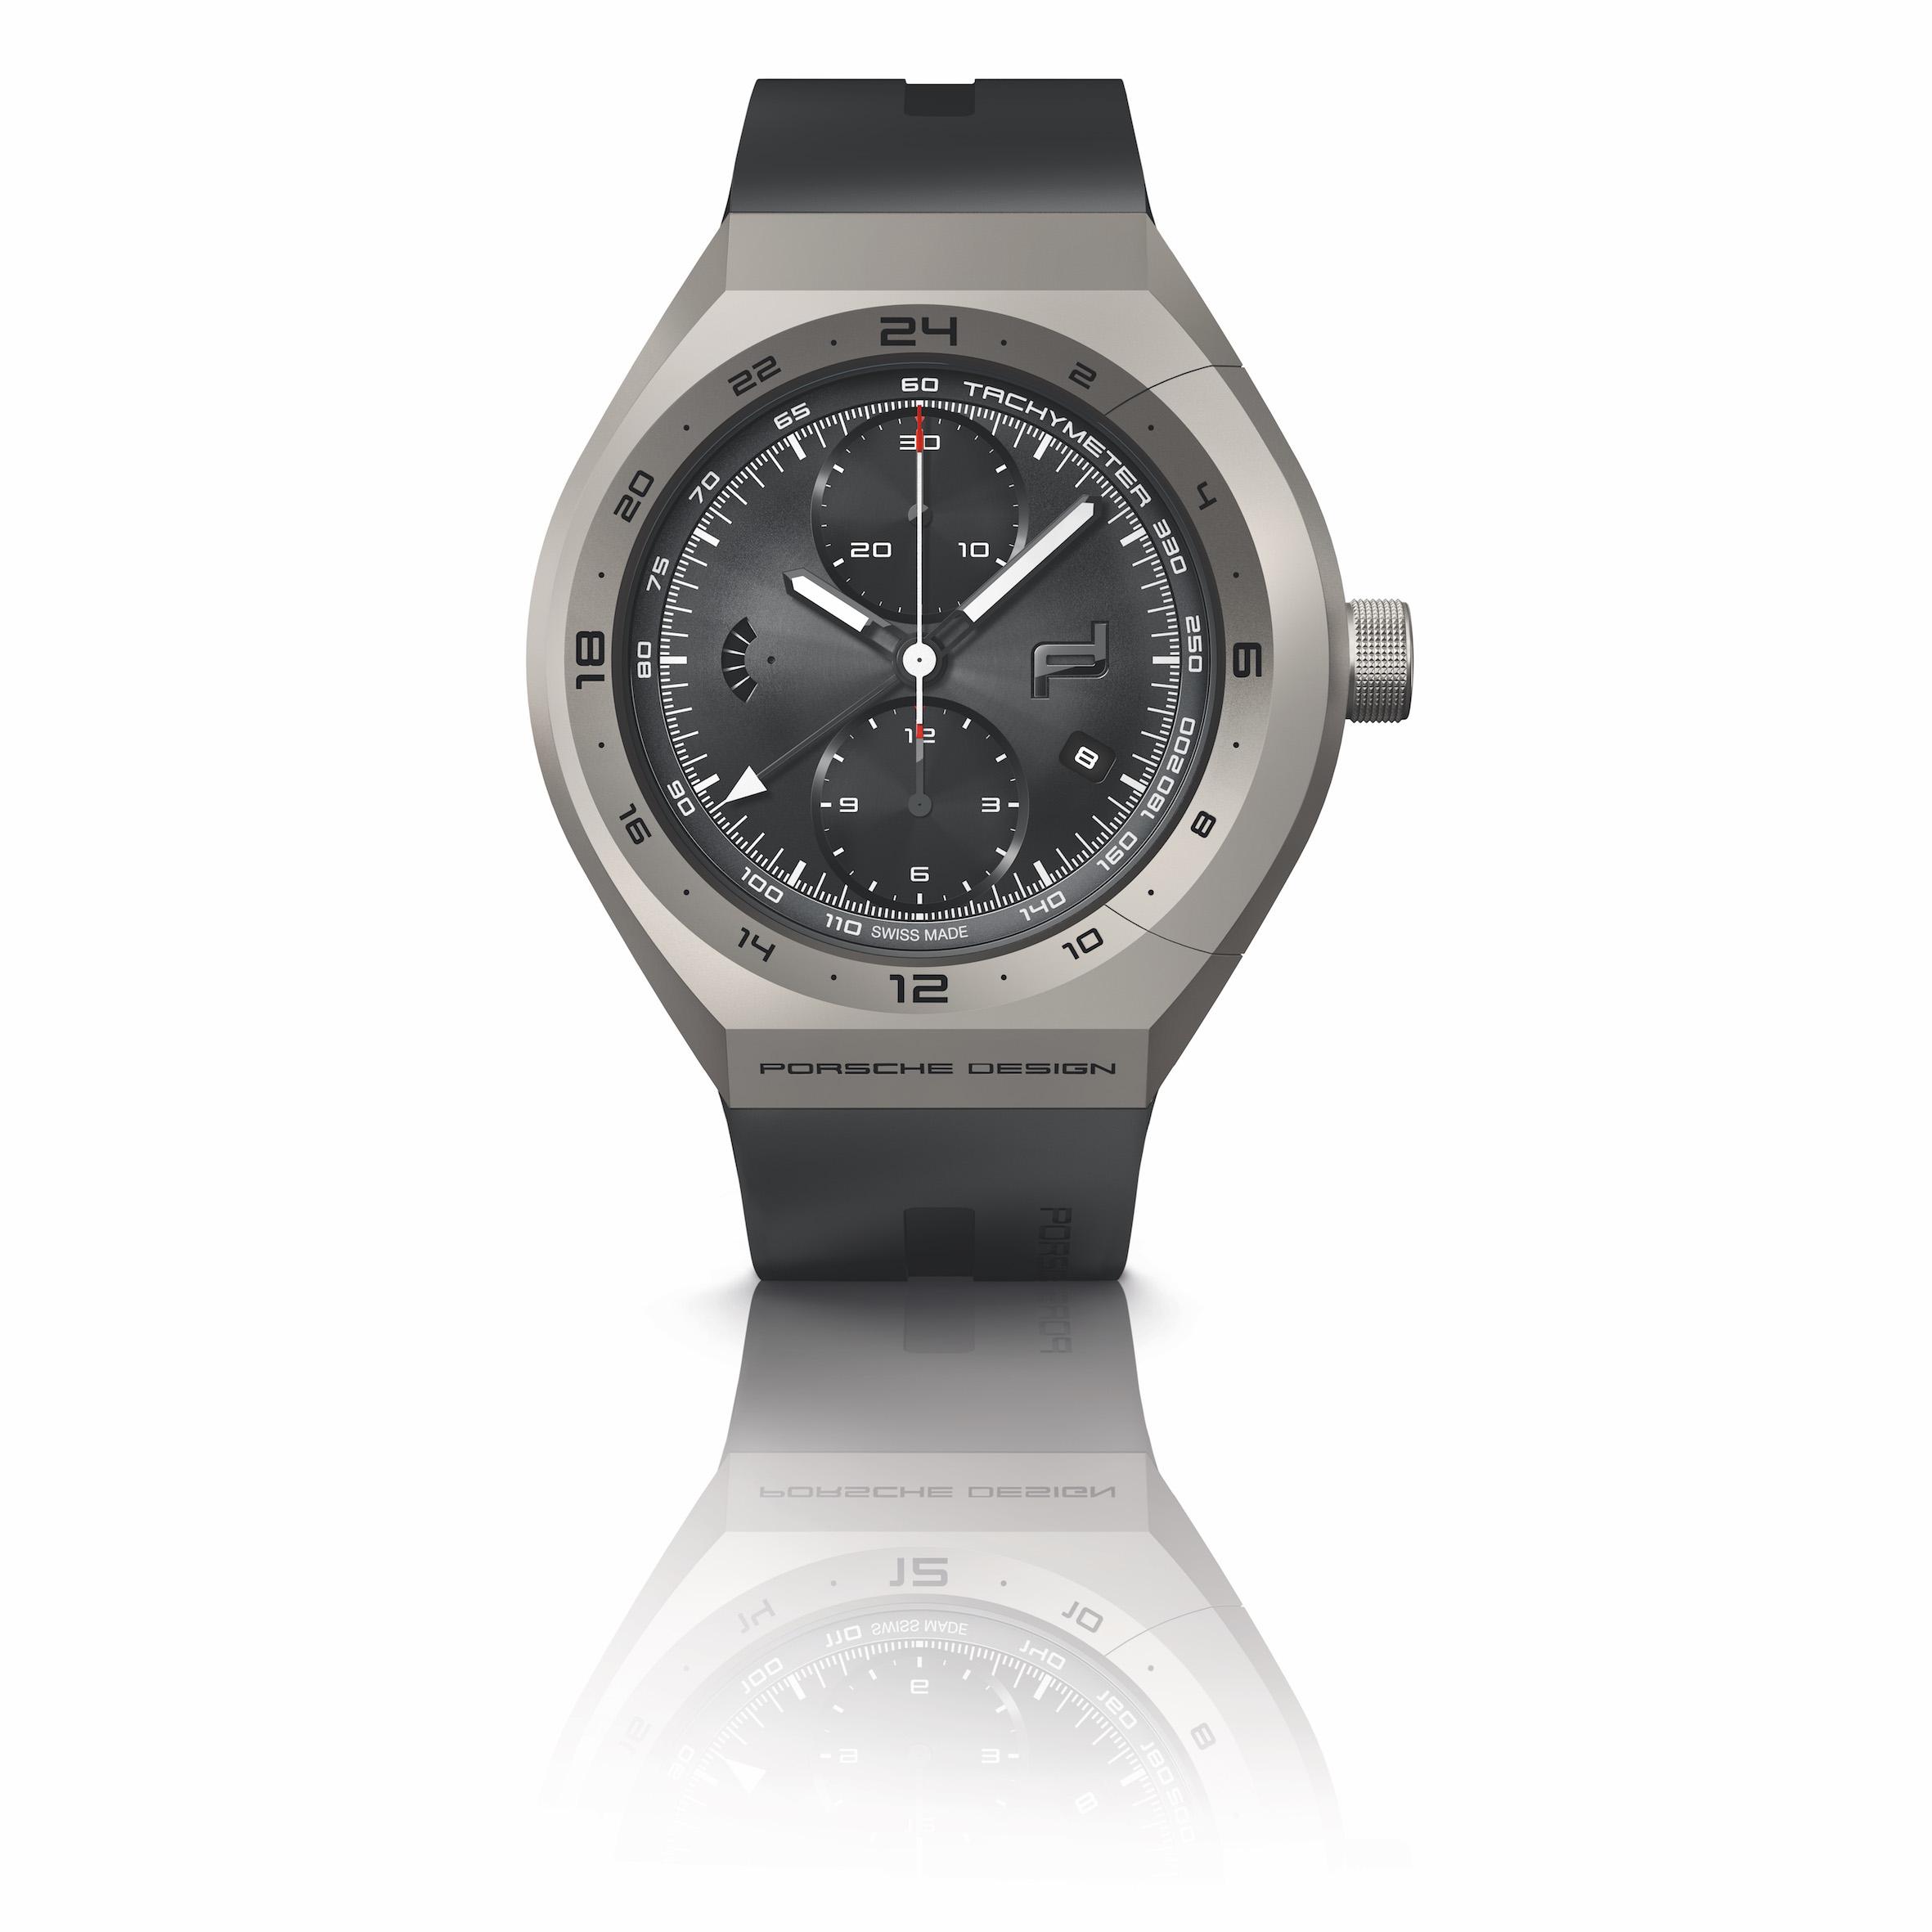 Porsche Design Monobloc Actuartor GMT Chronograph Titanium & Rubber